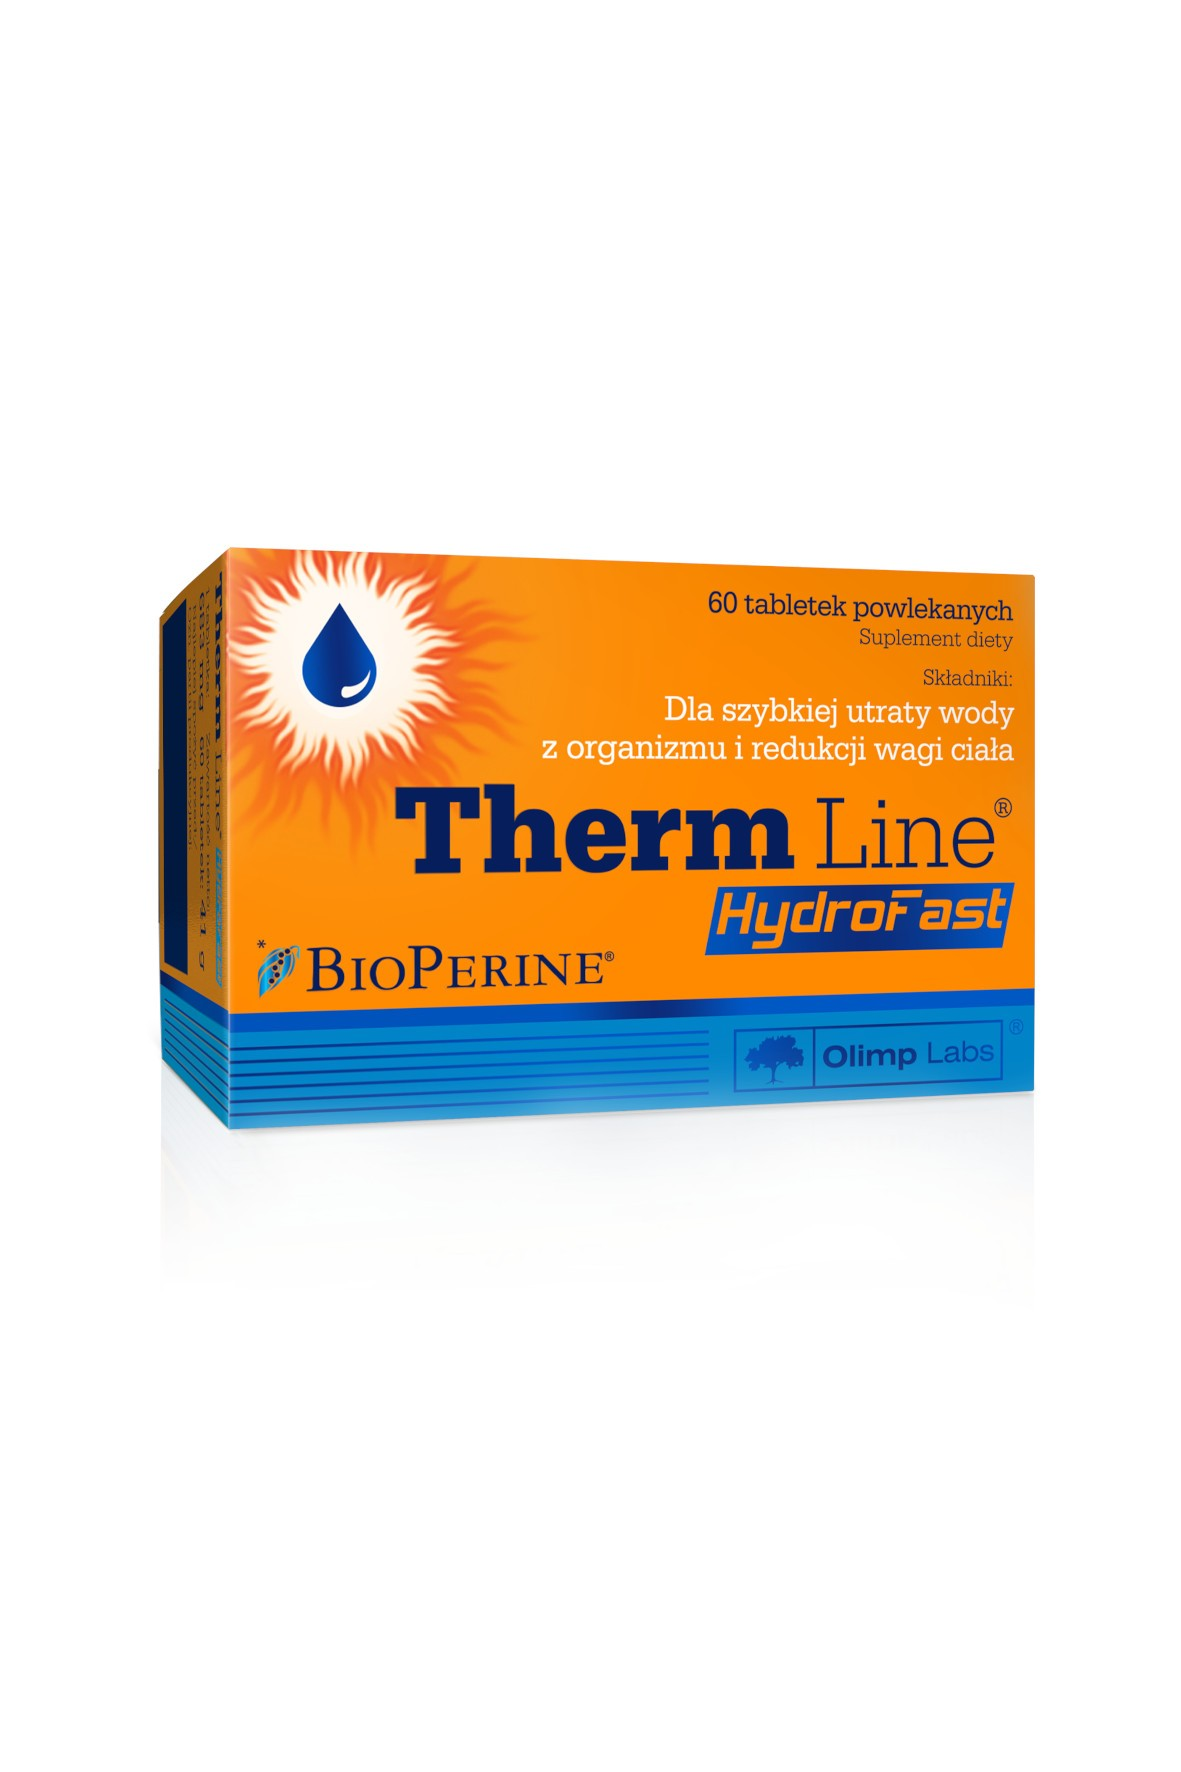 Therm Line HydroFast 60 tabletek